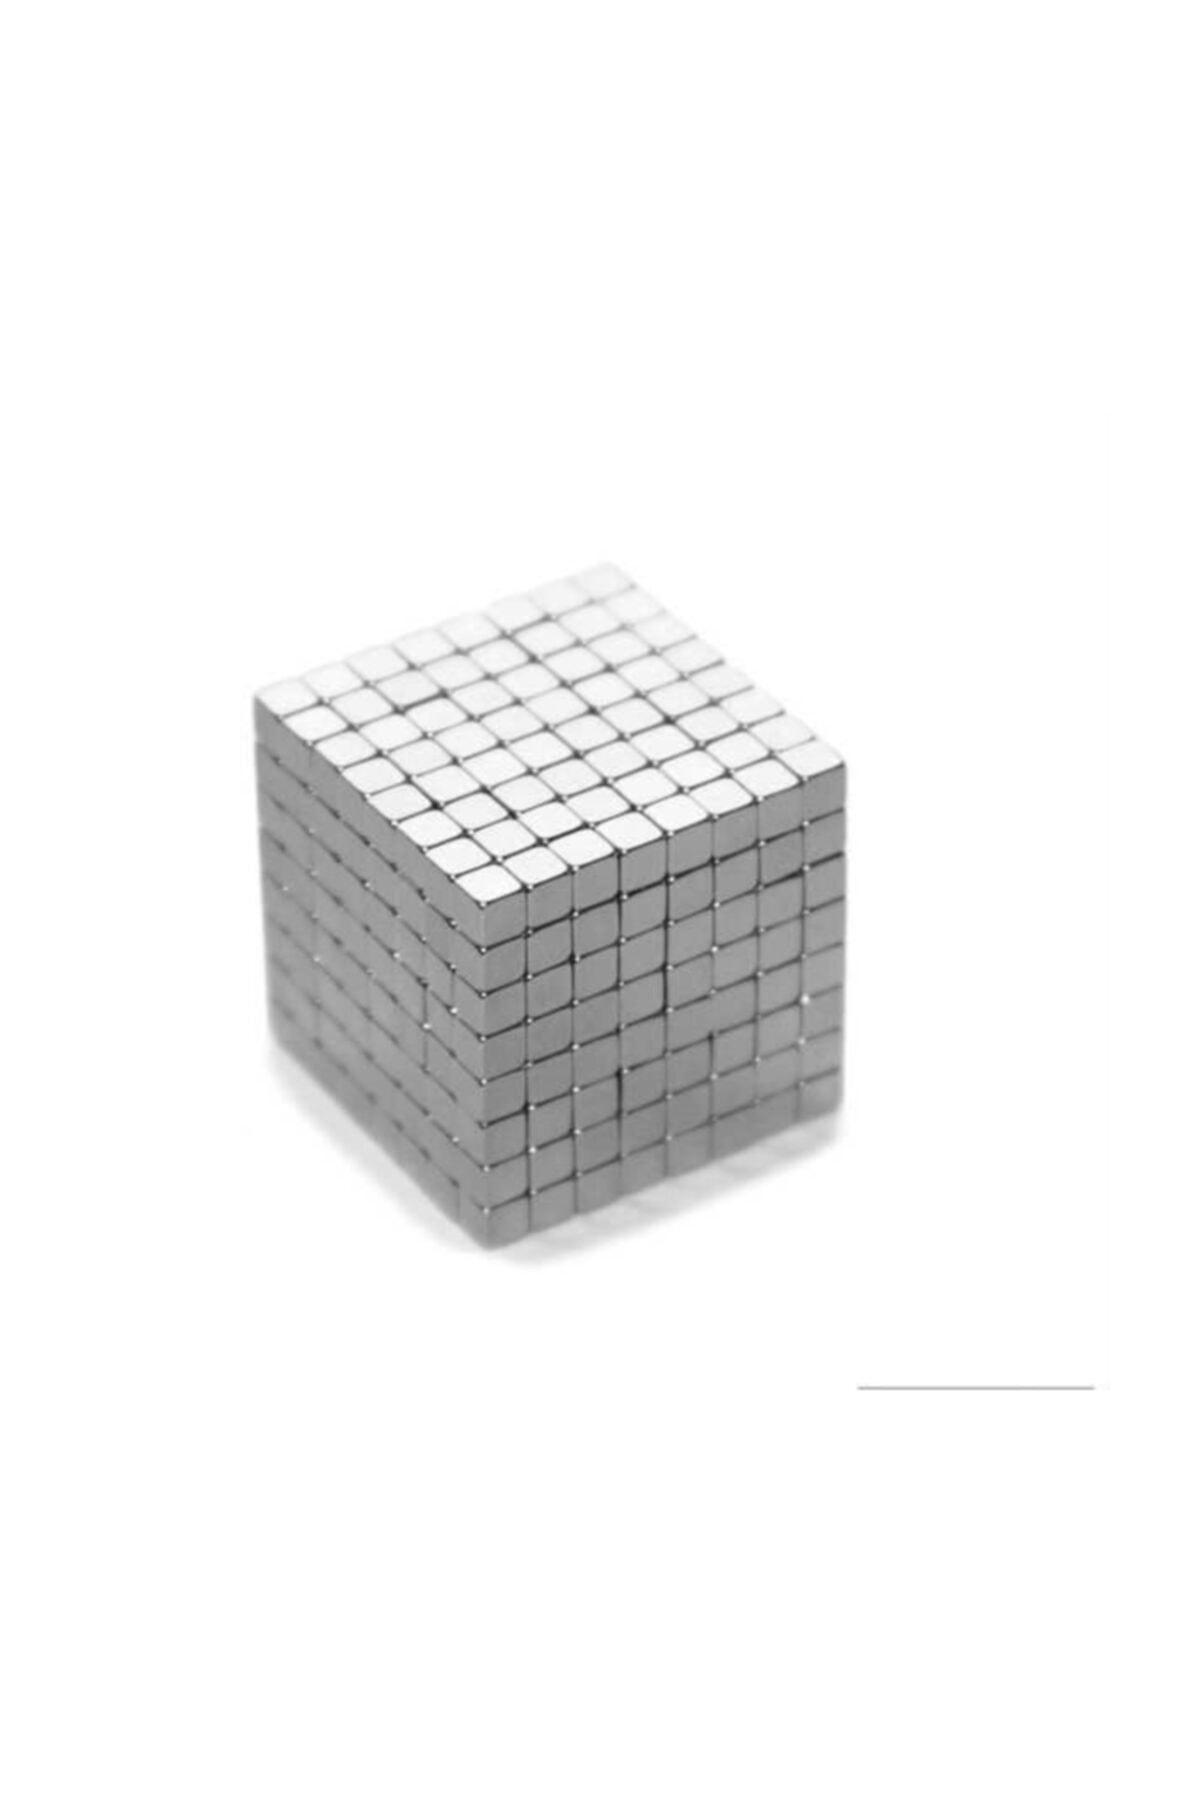 Dünya Magnet 50 Adet 3mm x 3mm X 3mm Güçlü Küp Neodyum Mıknatıs(50'li Paket) 1